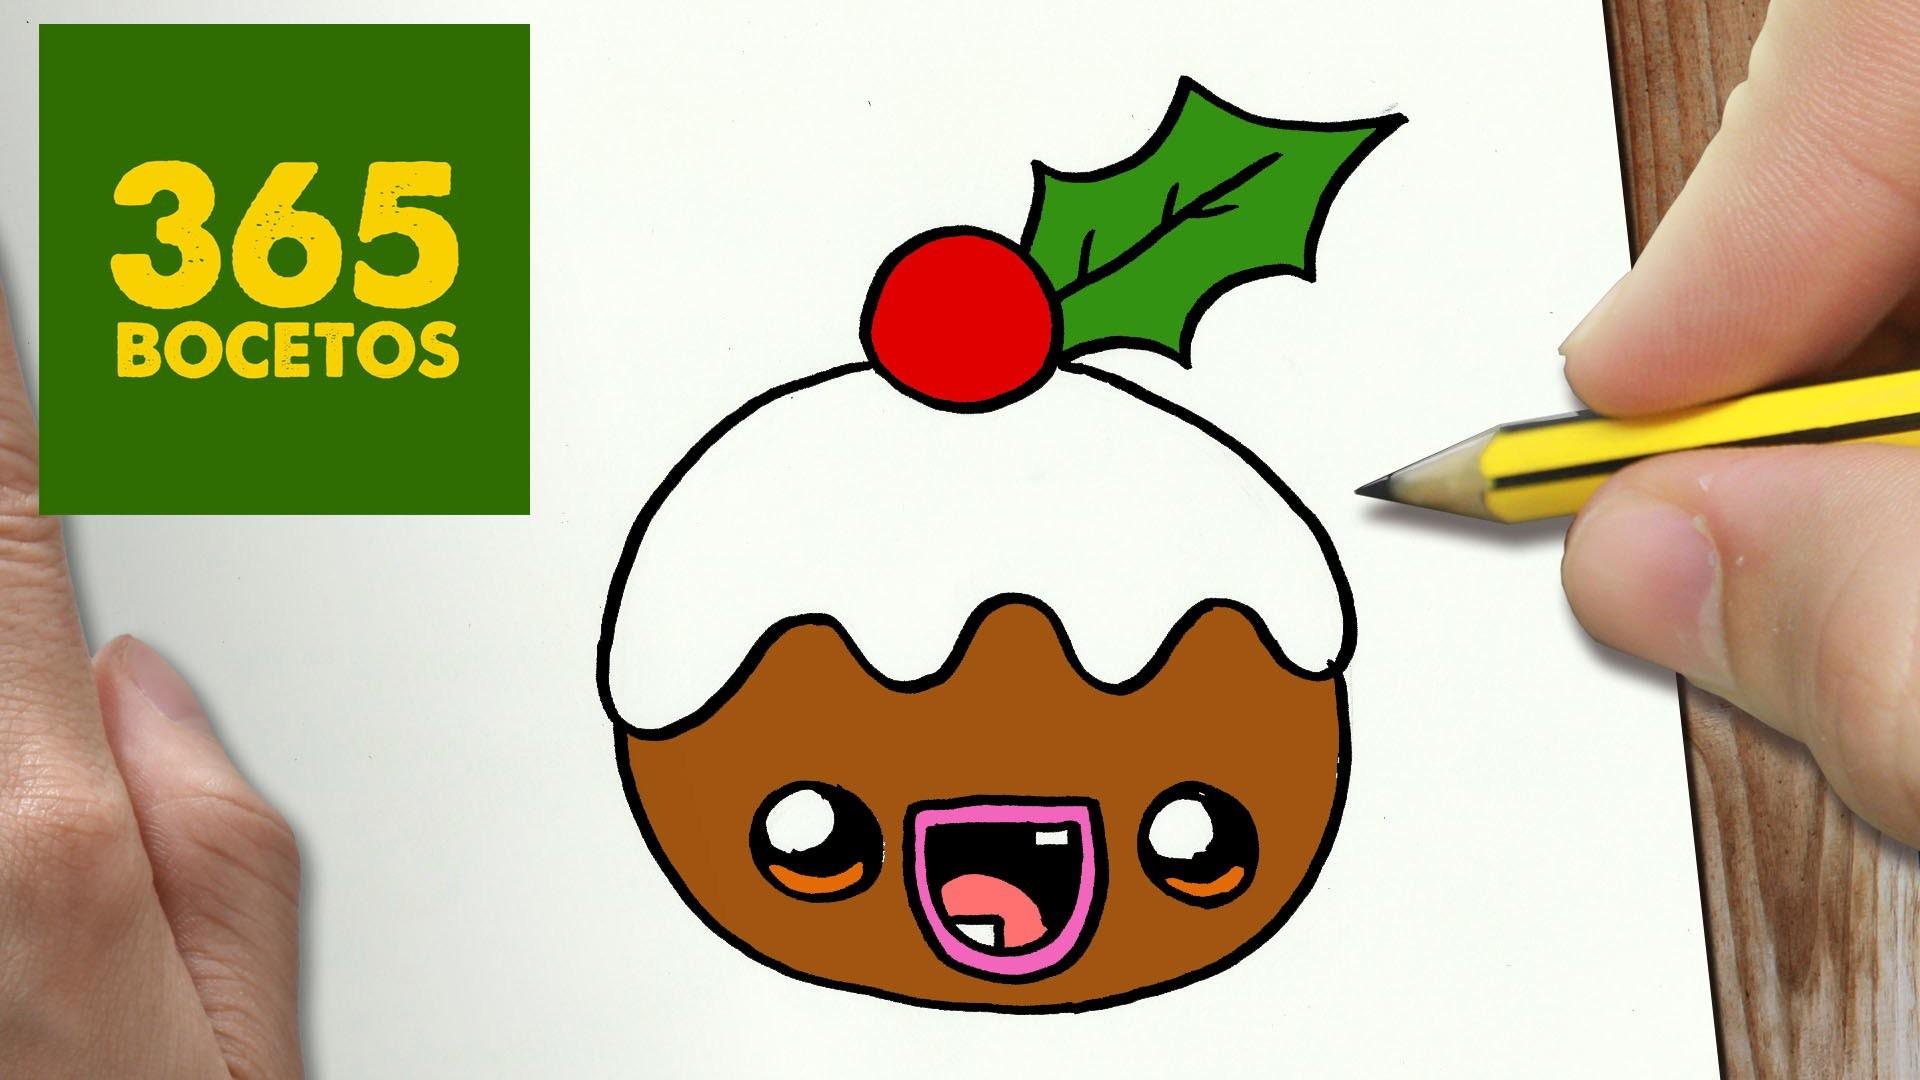 Como Dibujar Un Cuaderno Para Navidad Paso A Paso Dibujos: COMO DIBUJAR UN GALLETA PARA NAVIDAD PASO A PASO: Dibujos